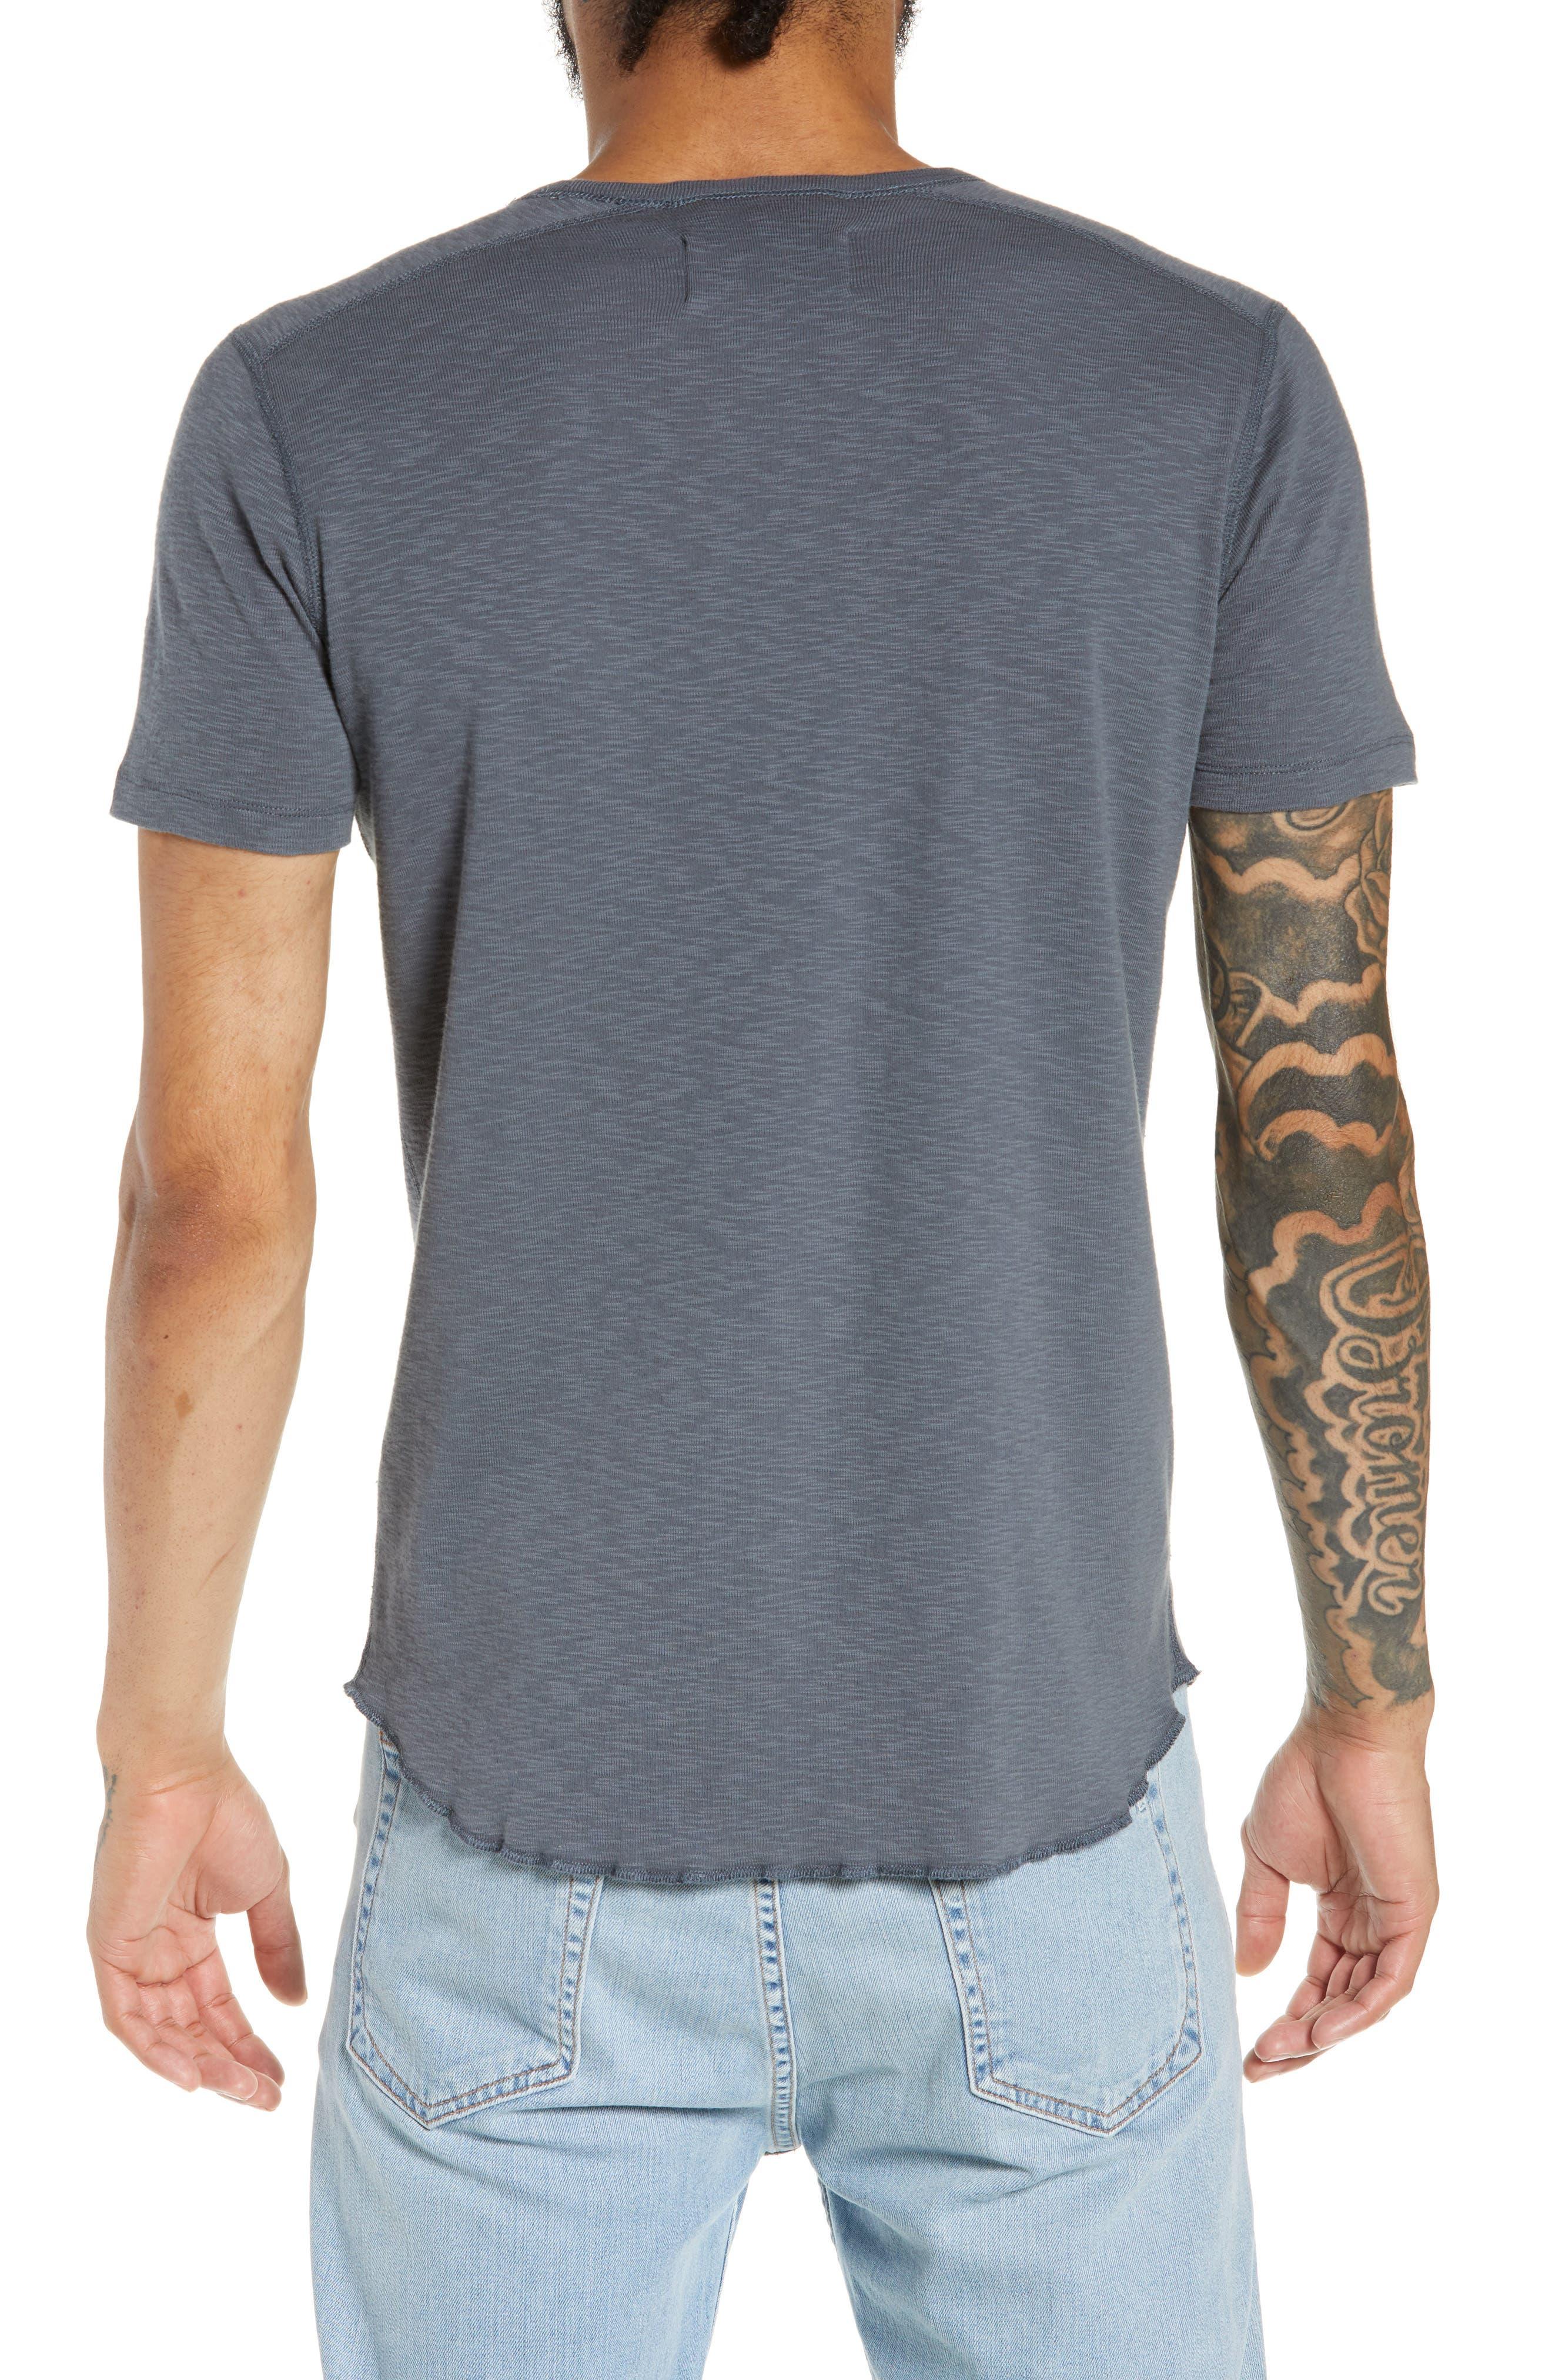 WINGS + HORNS, Ribbed Slub Cotton T-Shirt, Alternate thumbnail 2, color, SHADOW